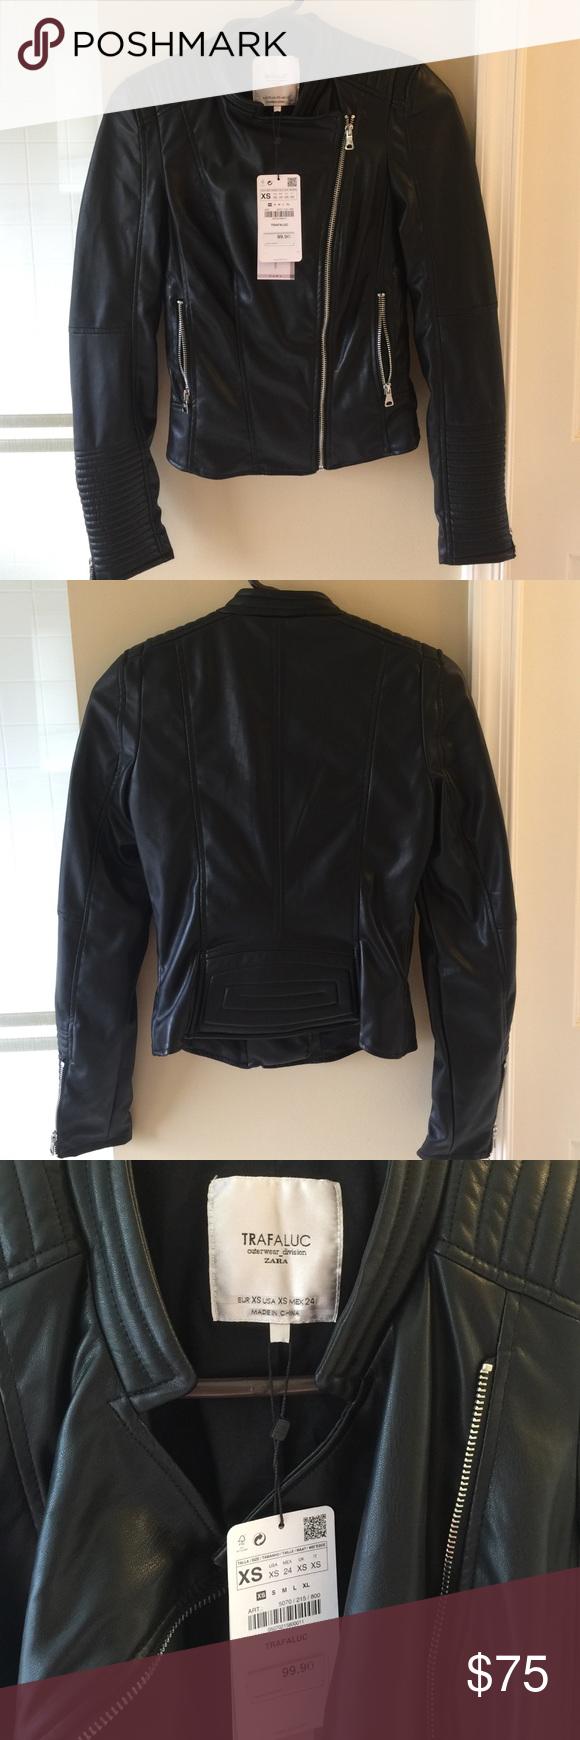 Leather jacket xs - Zara Leather Jacket Size Xs Gorgeous Zara Trafaluc Leather Jacket With Silver Zipper Detailing And Black